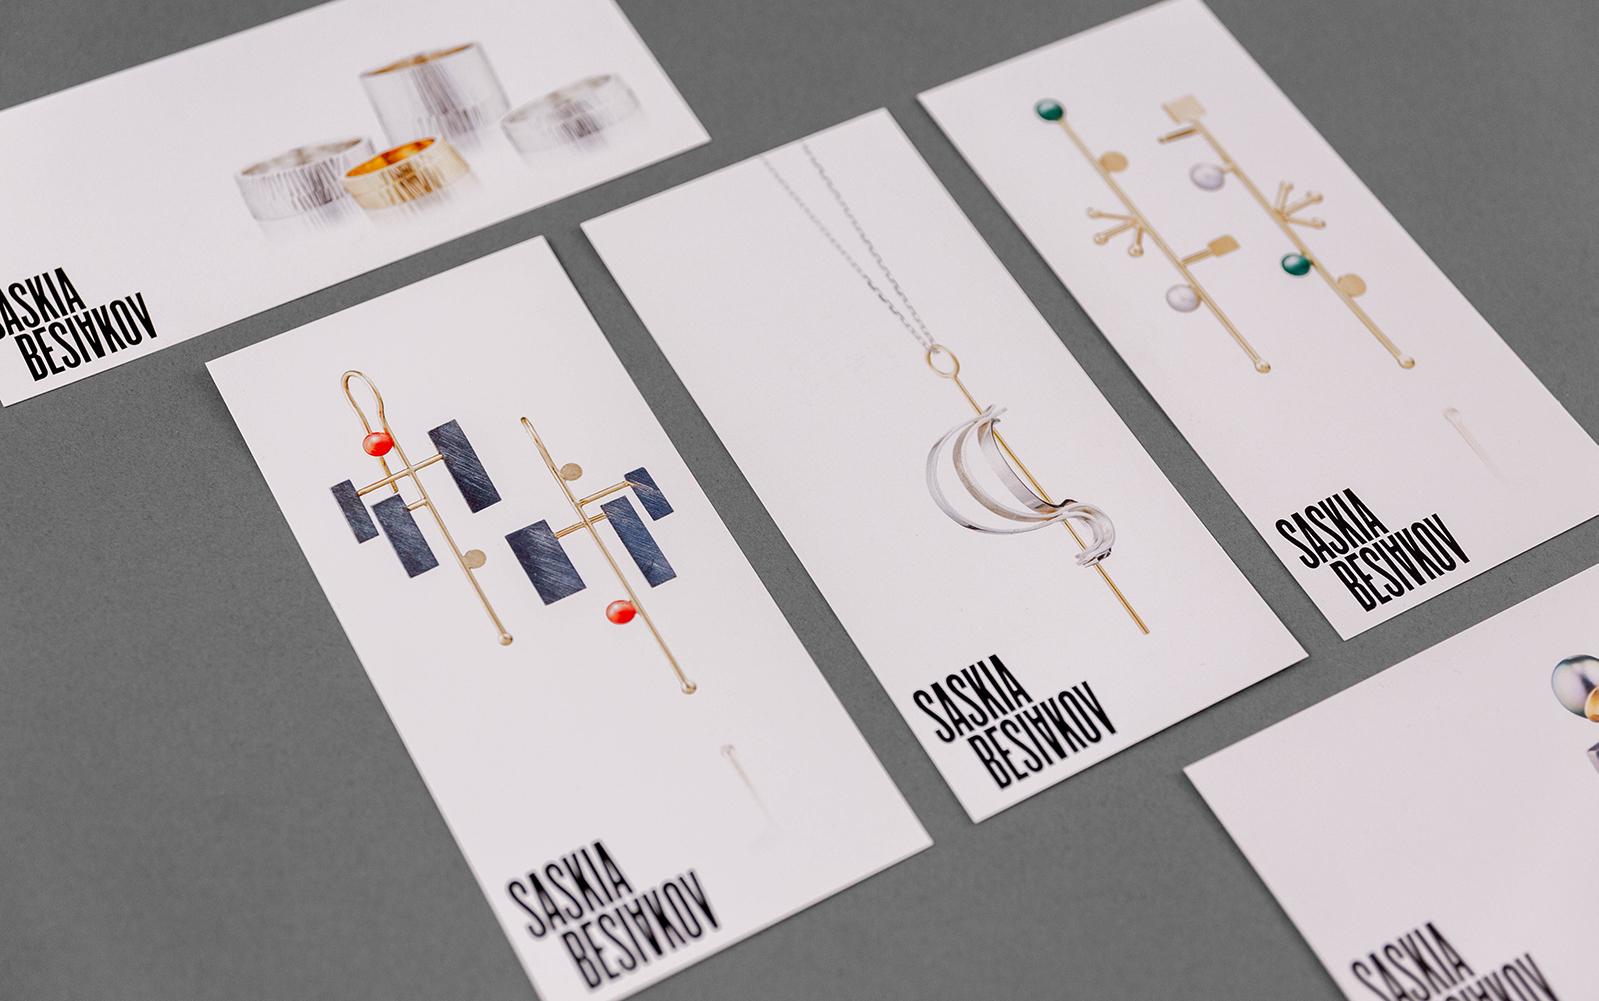 Saskia Besiakov postkort